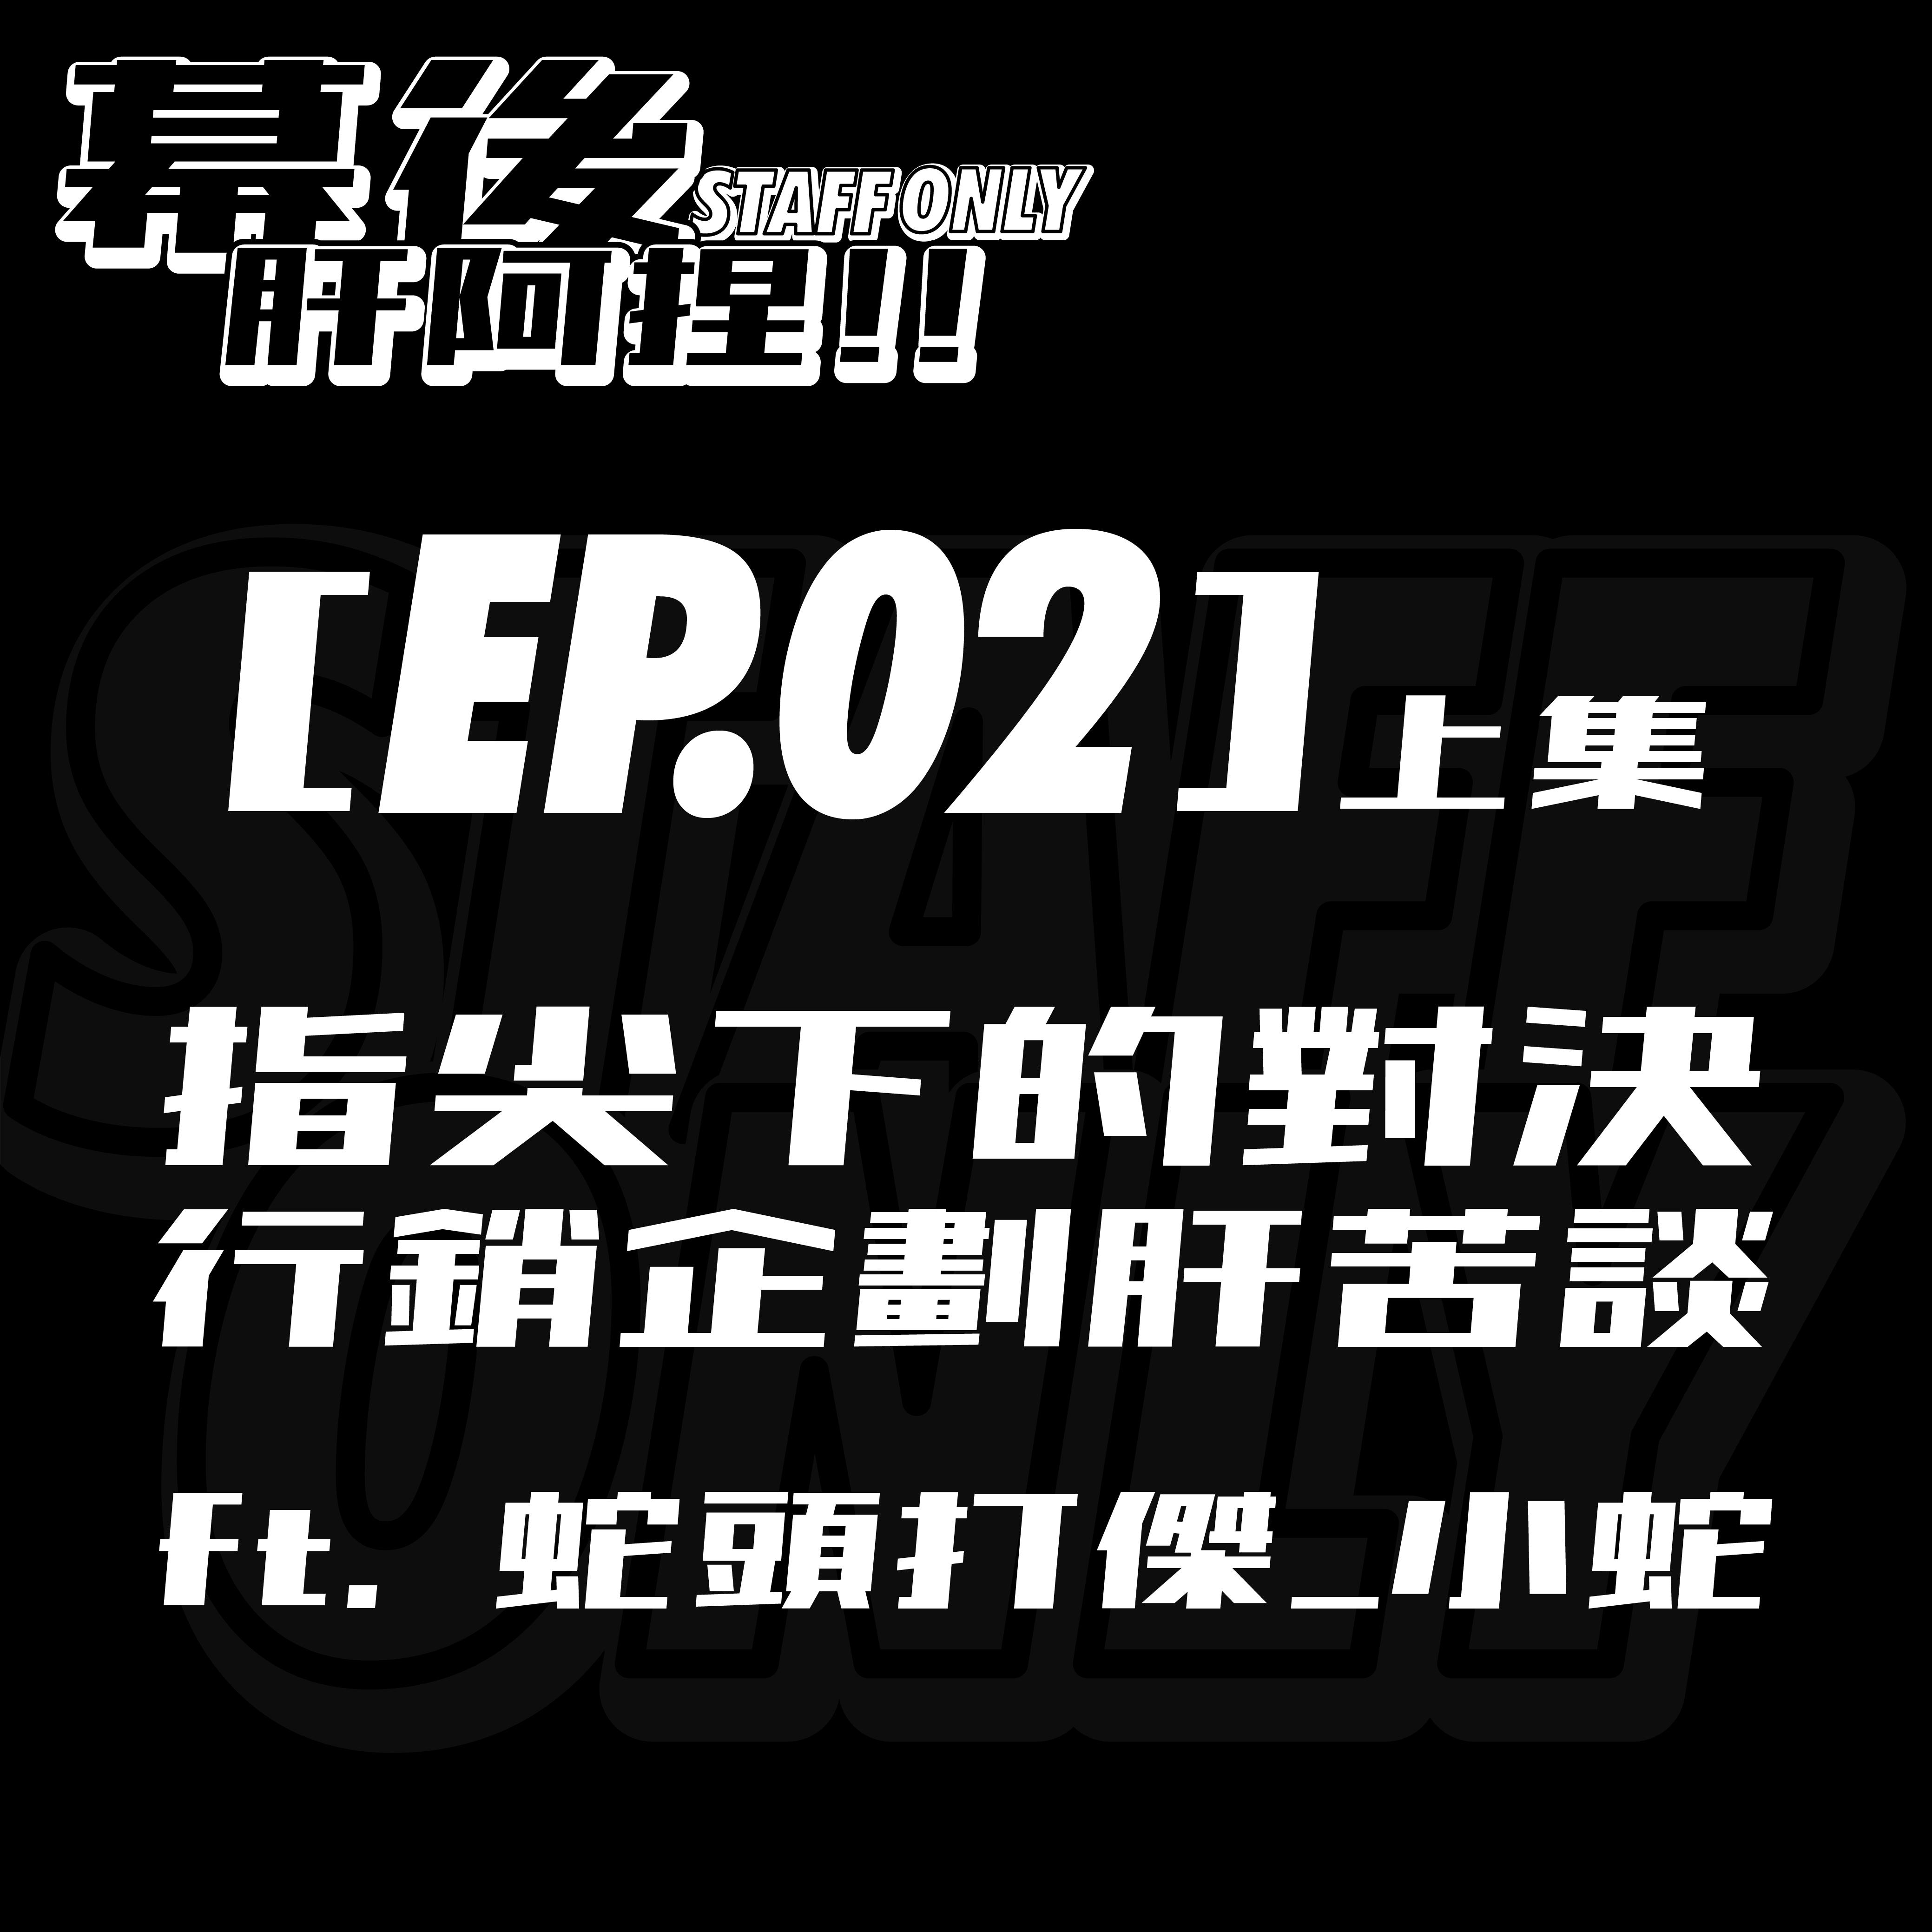 【Ep.02】指尖下的對決-行銷企劃肝苦談 ft. 蛇頭打傑_小蛇 (上)